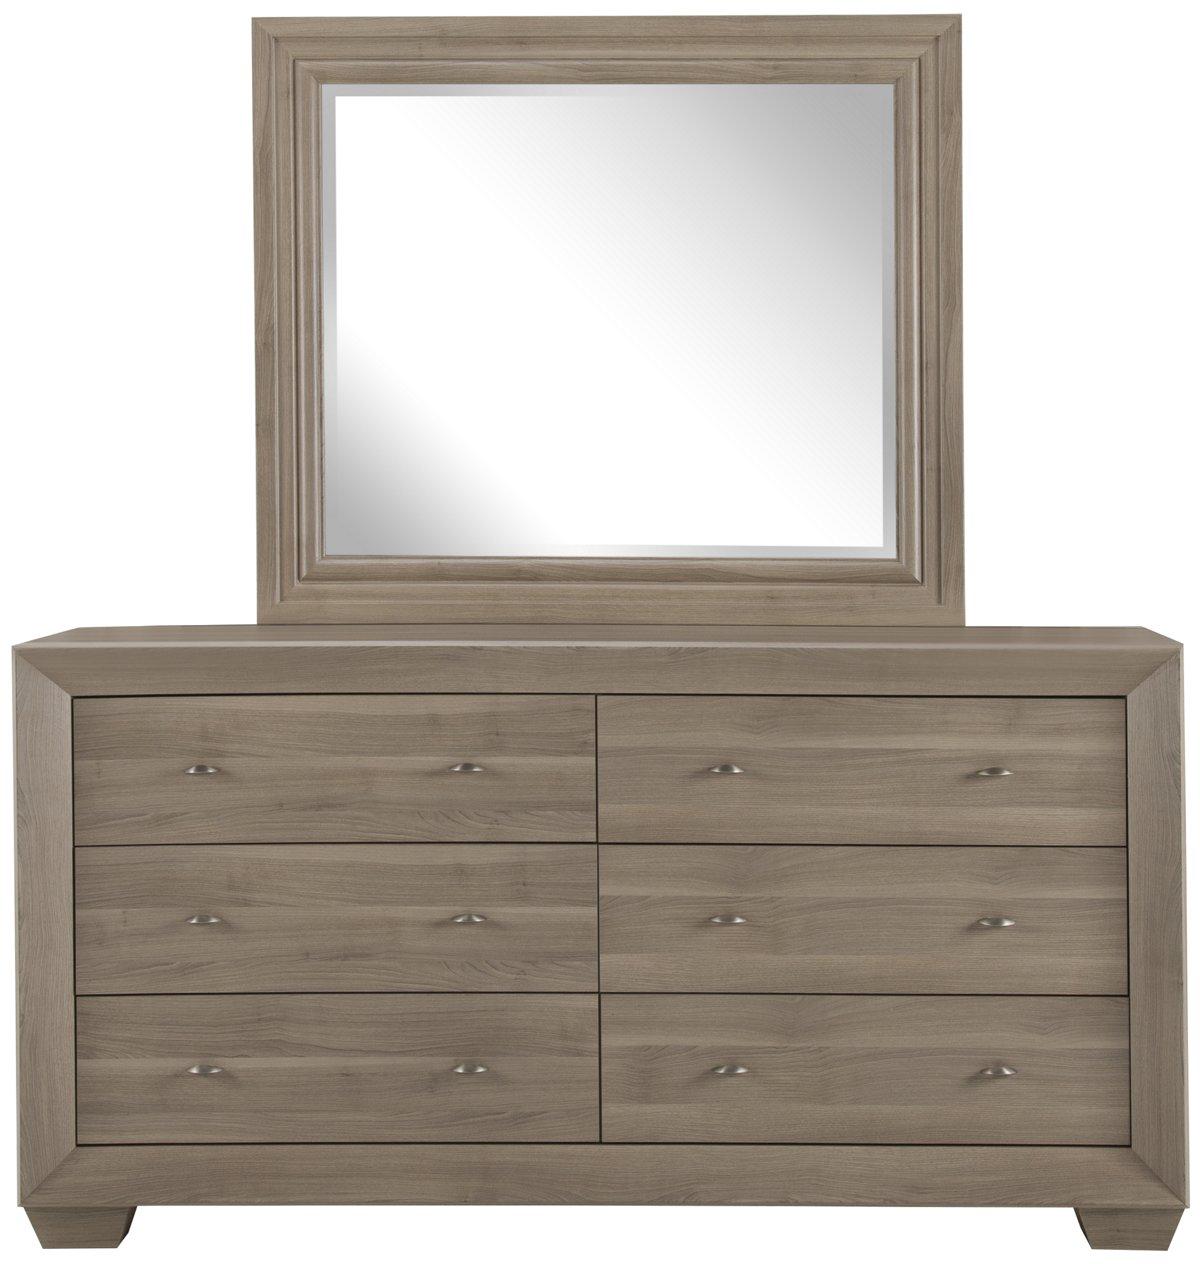 Bedroom Furniture Memorial Day Sale